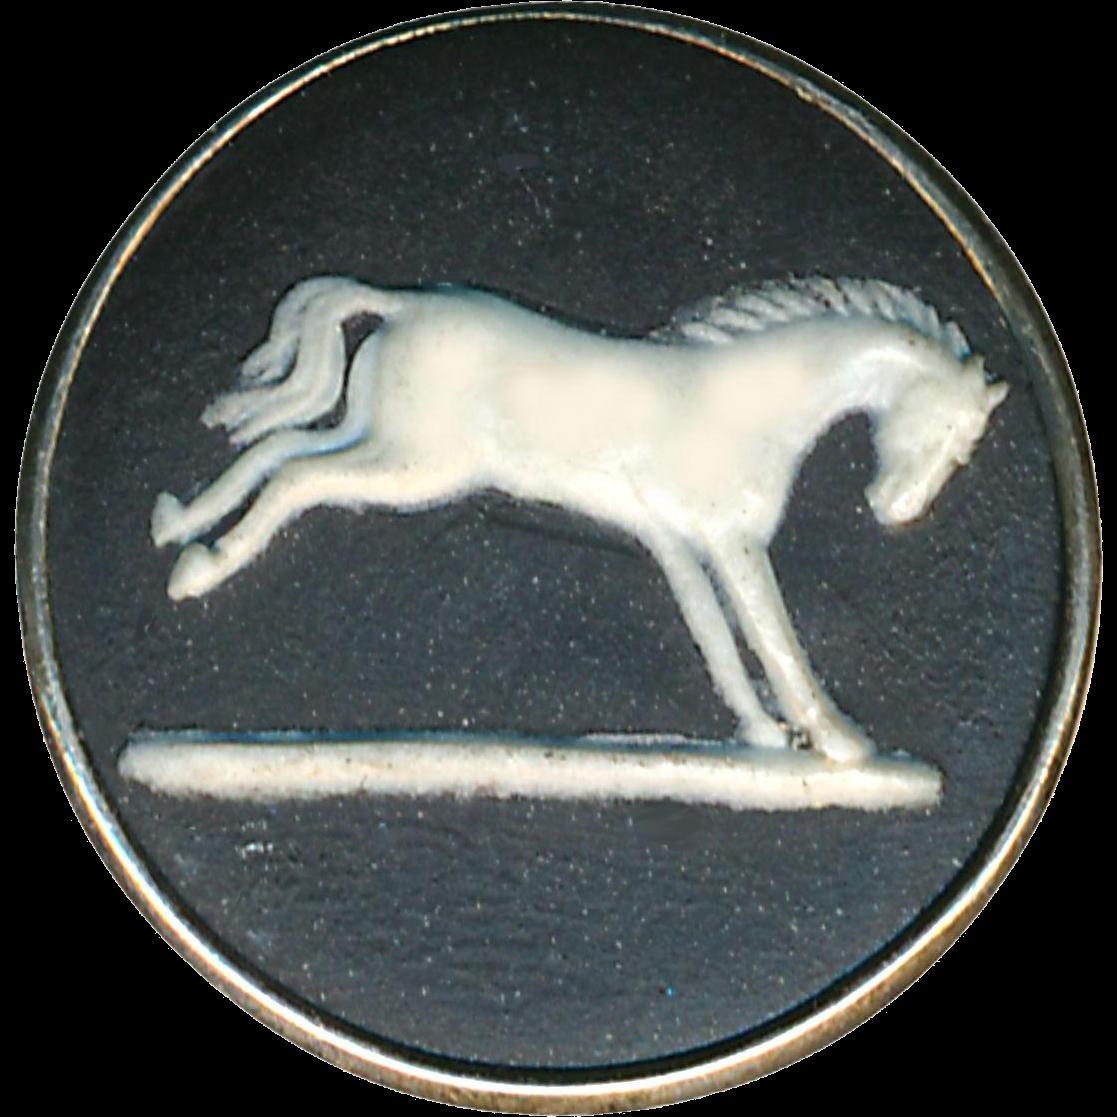 Button--Medium 19th C. Wedgwood Jasperware White Horse on Black Jasper